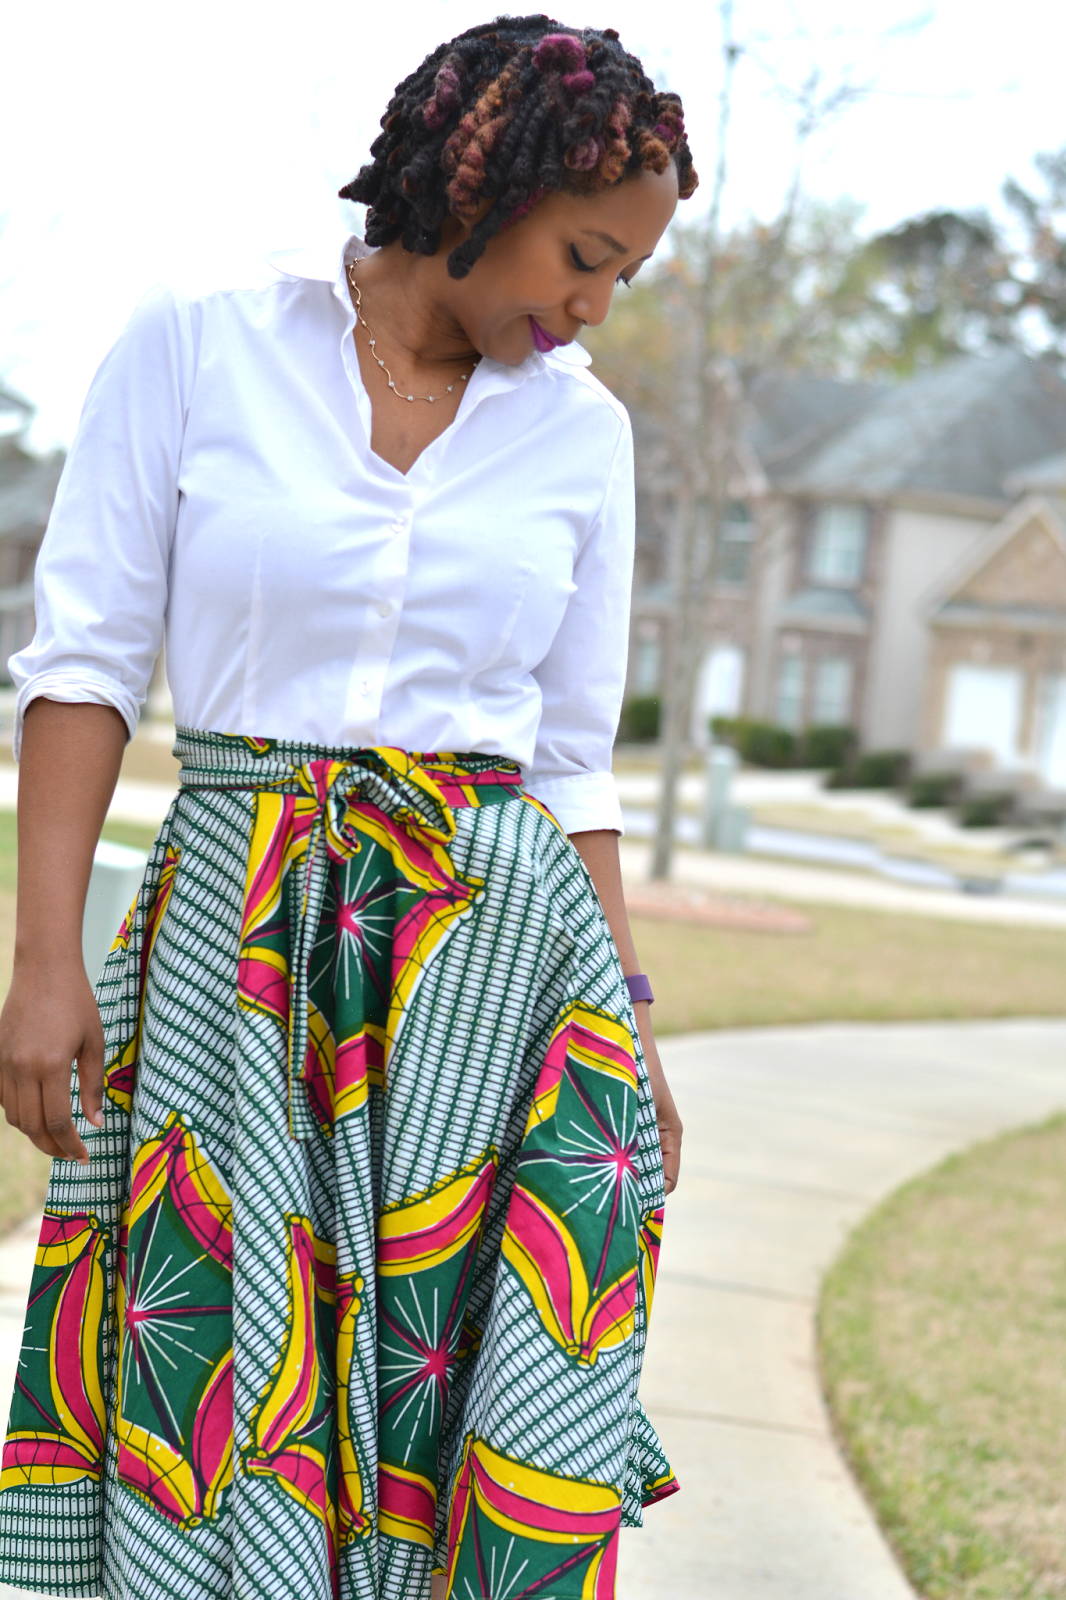 African Skirts Patterns : african, skirts, patterns, African, Print, Skirt, Skirt,, Dress, Patterns,, Skirts